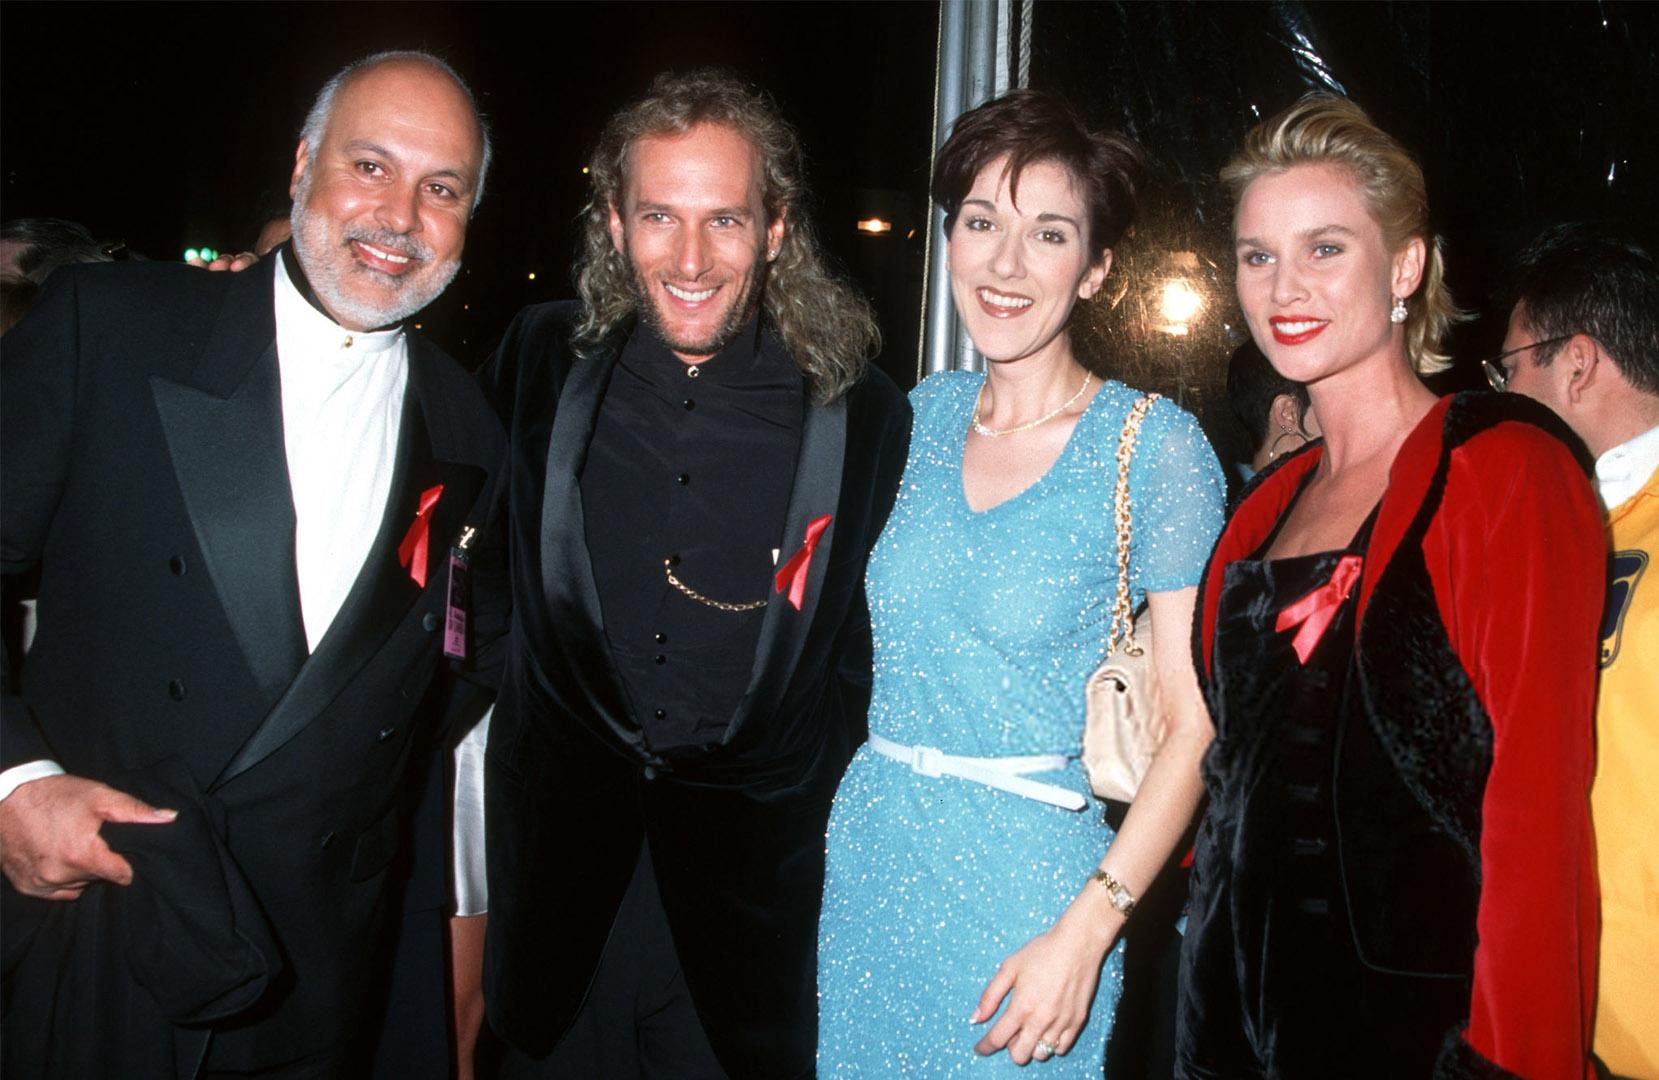 René Angélil, Michael Bolton, Céline Dion, Nicollette Sheridan (Photo by Jim Smeal/Ron Galella Collection via Getty Images)